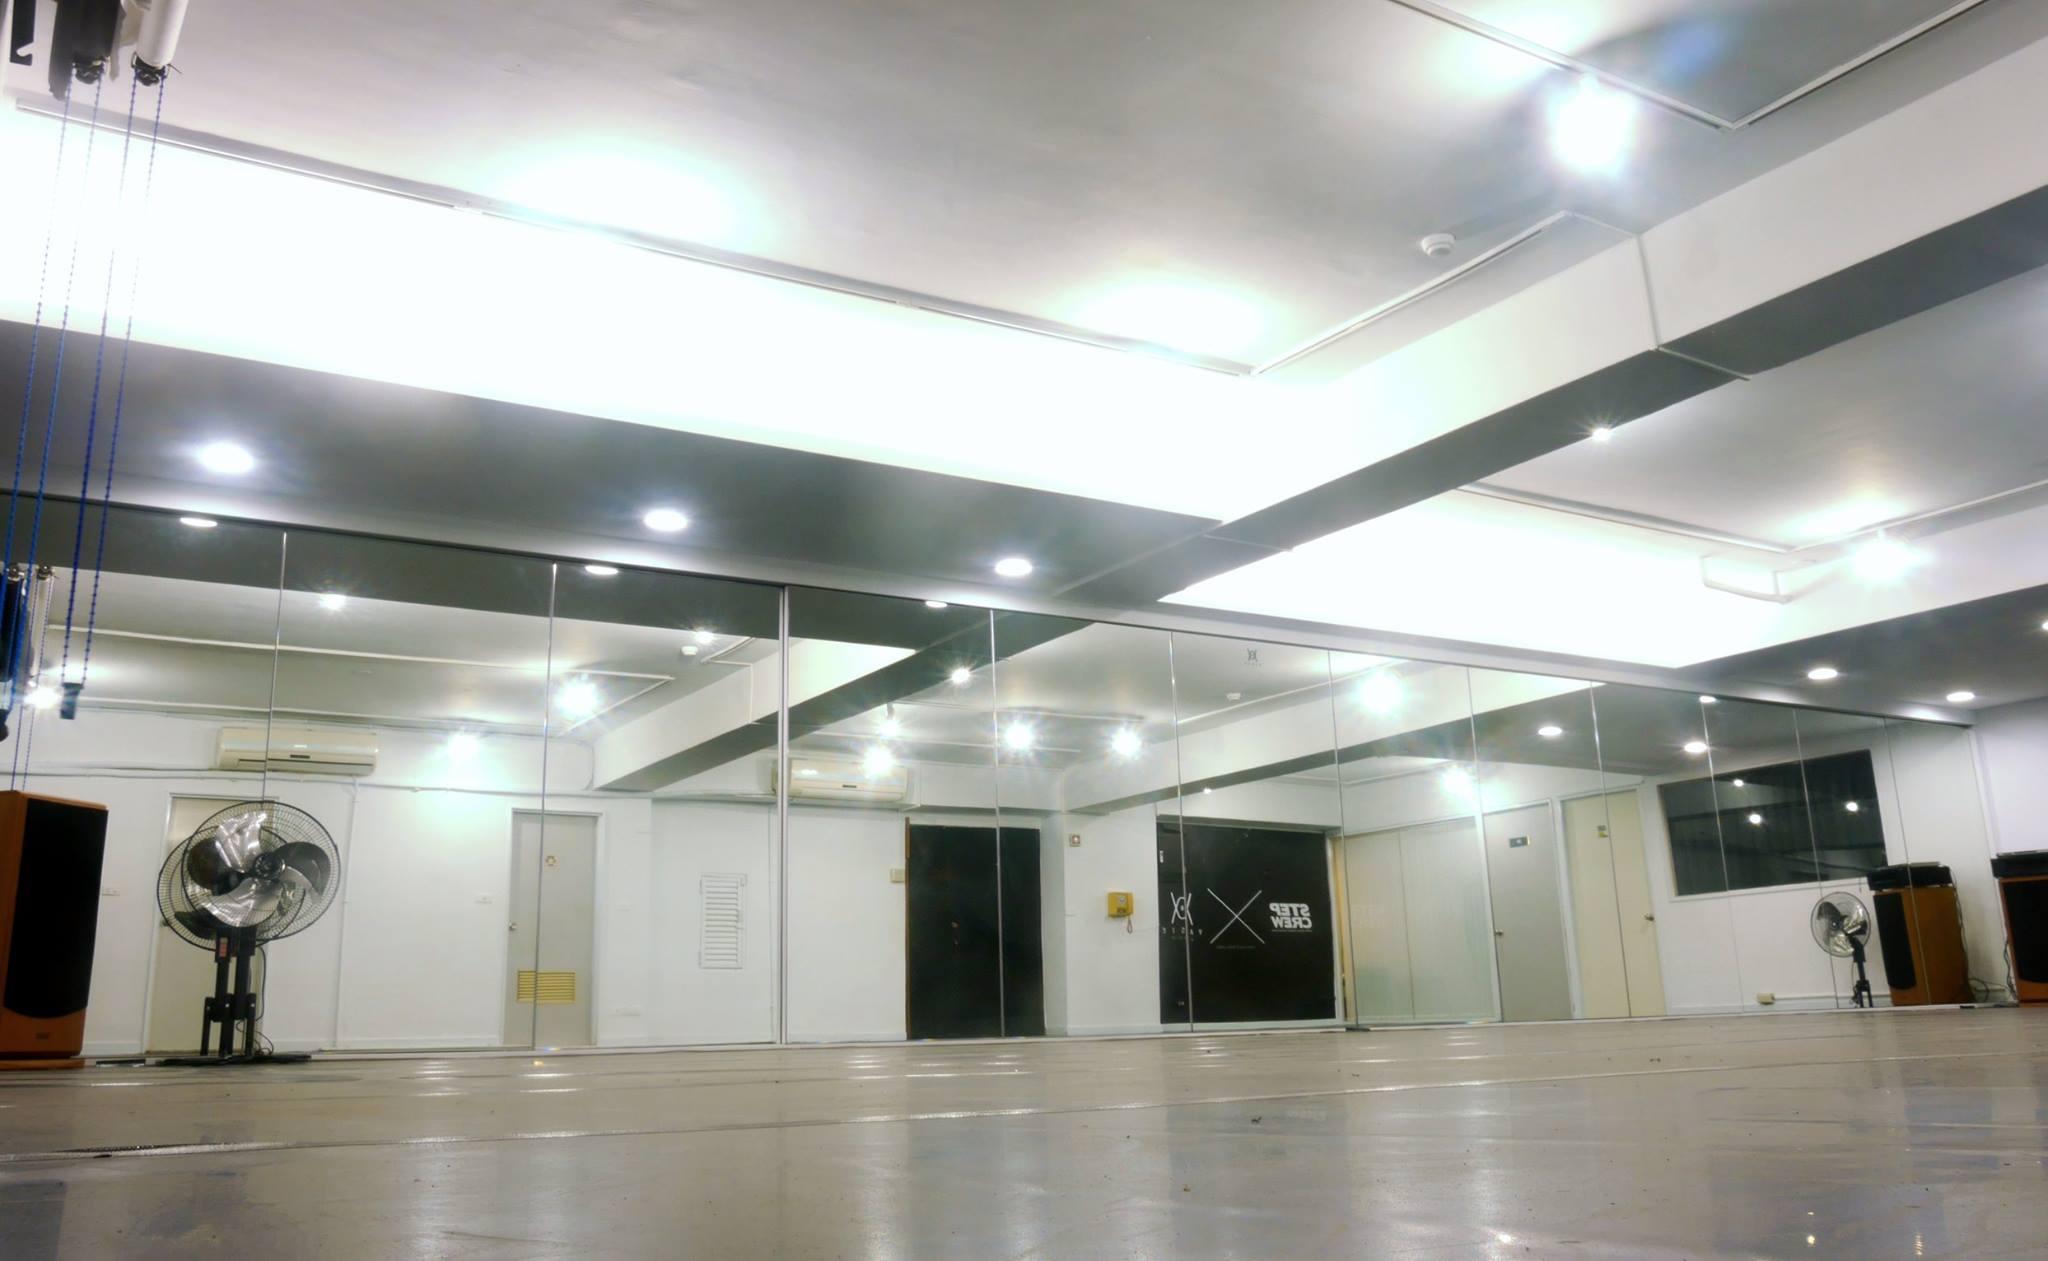 Vaste Studio/西門町空間租借/大型舞蹈教室/攝影棚承租/排練場地/展演空間/30坪/0976517460 - 20150316000151-435444609.jpg(圖)